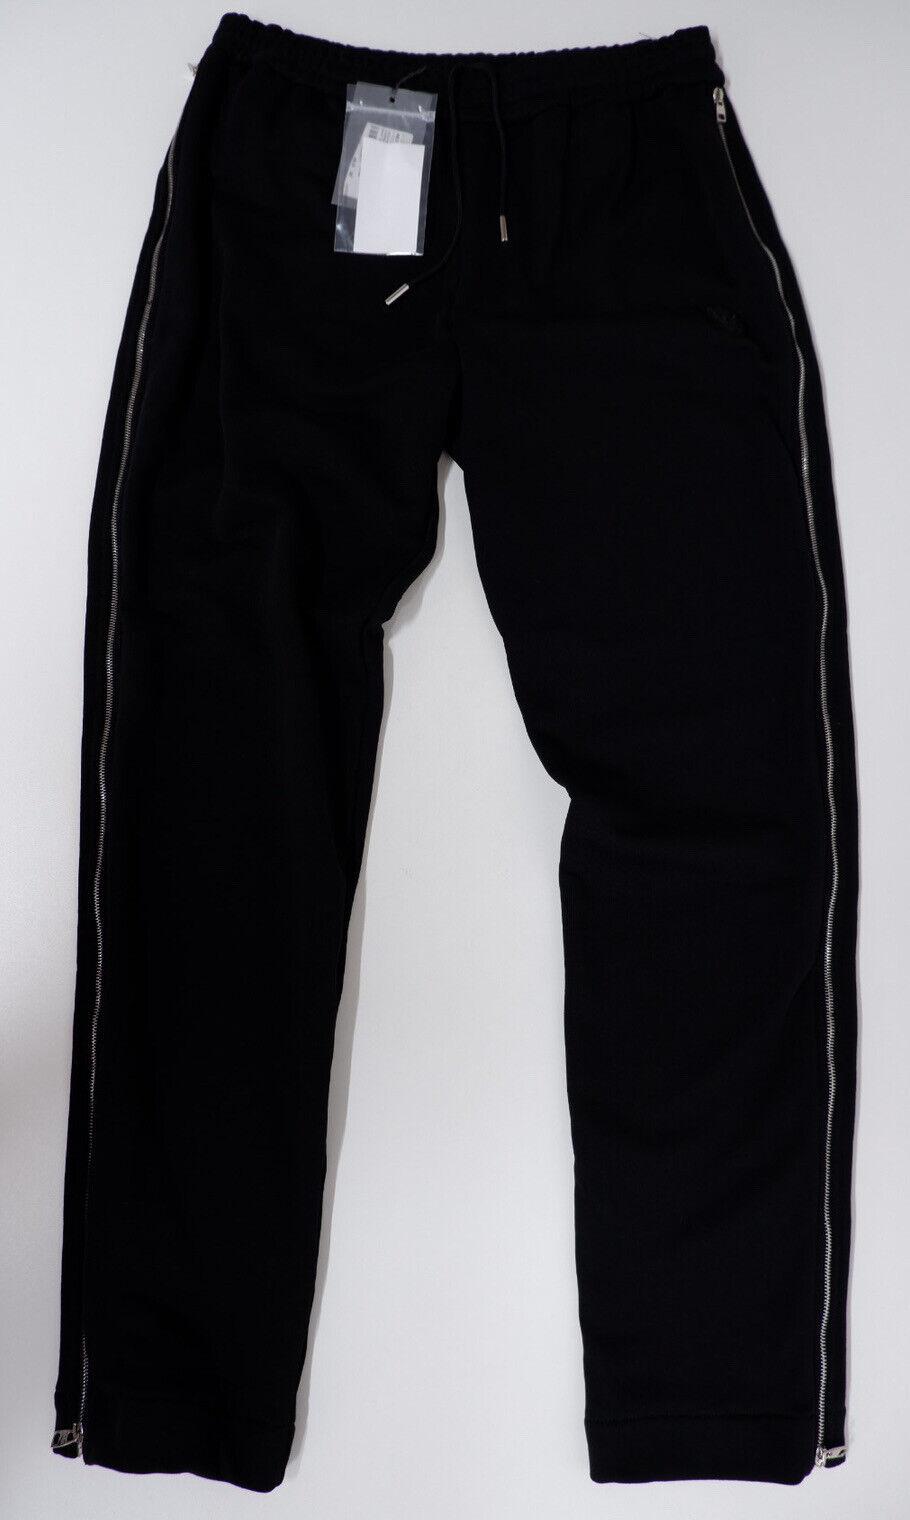 Alexander McQueen Mens Organic Cotton Jogging Bottoms, Pants, Medium, Black, NEW